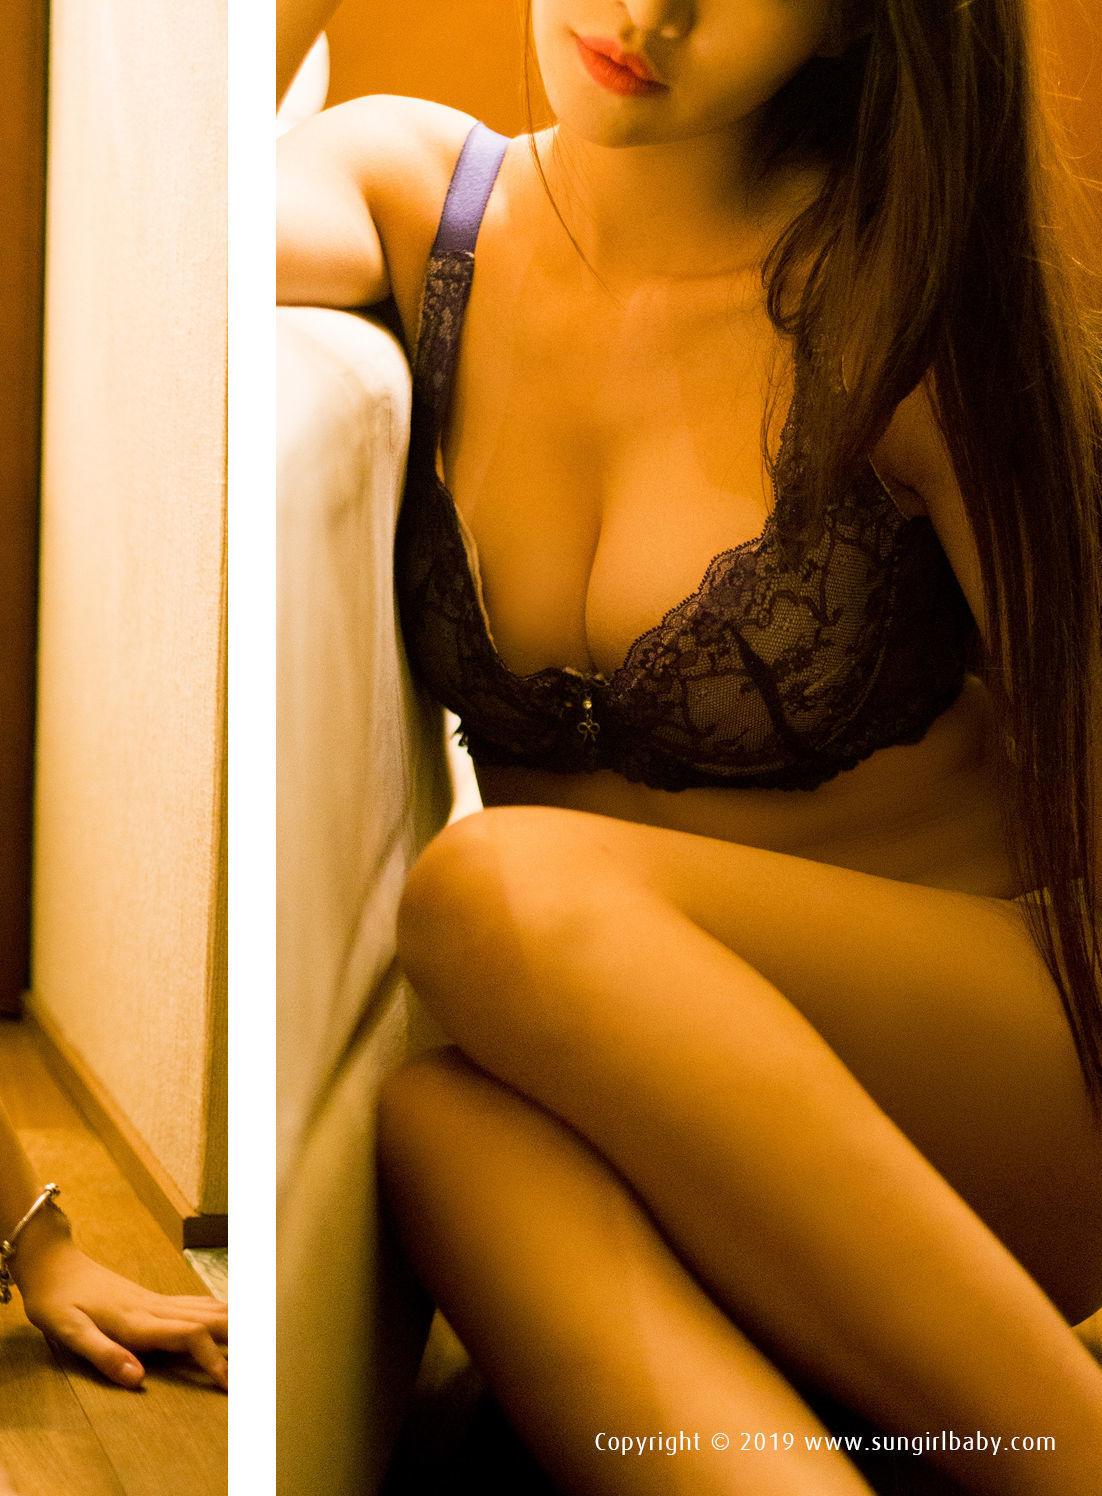 MIDE-870细腰翘臀美女诱人好身材性感图片